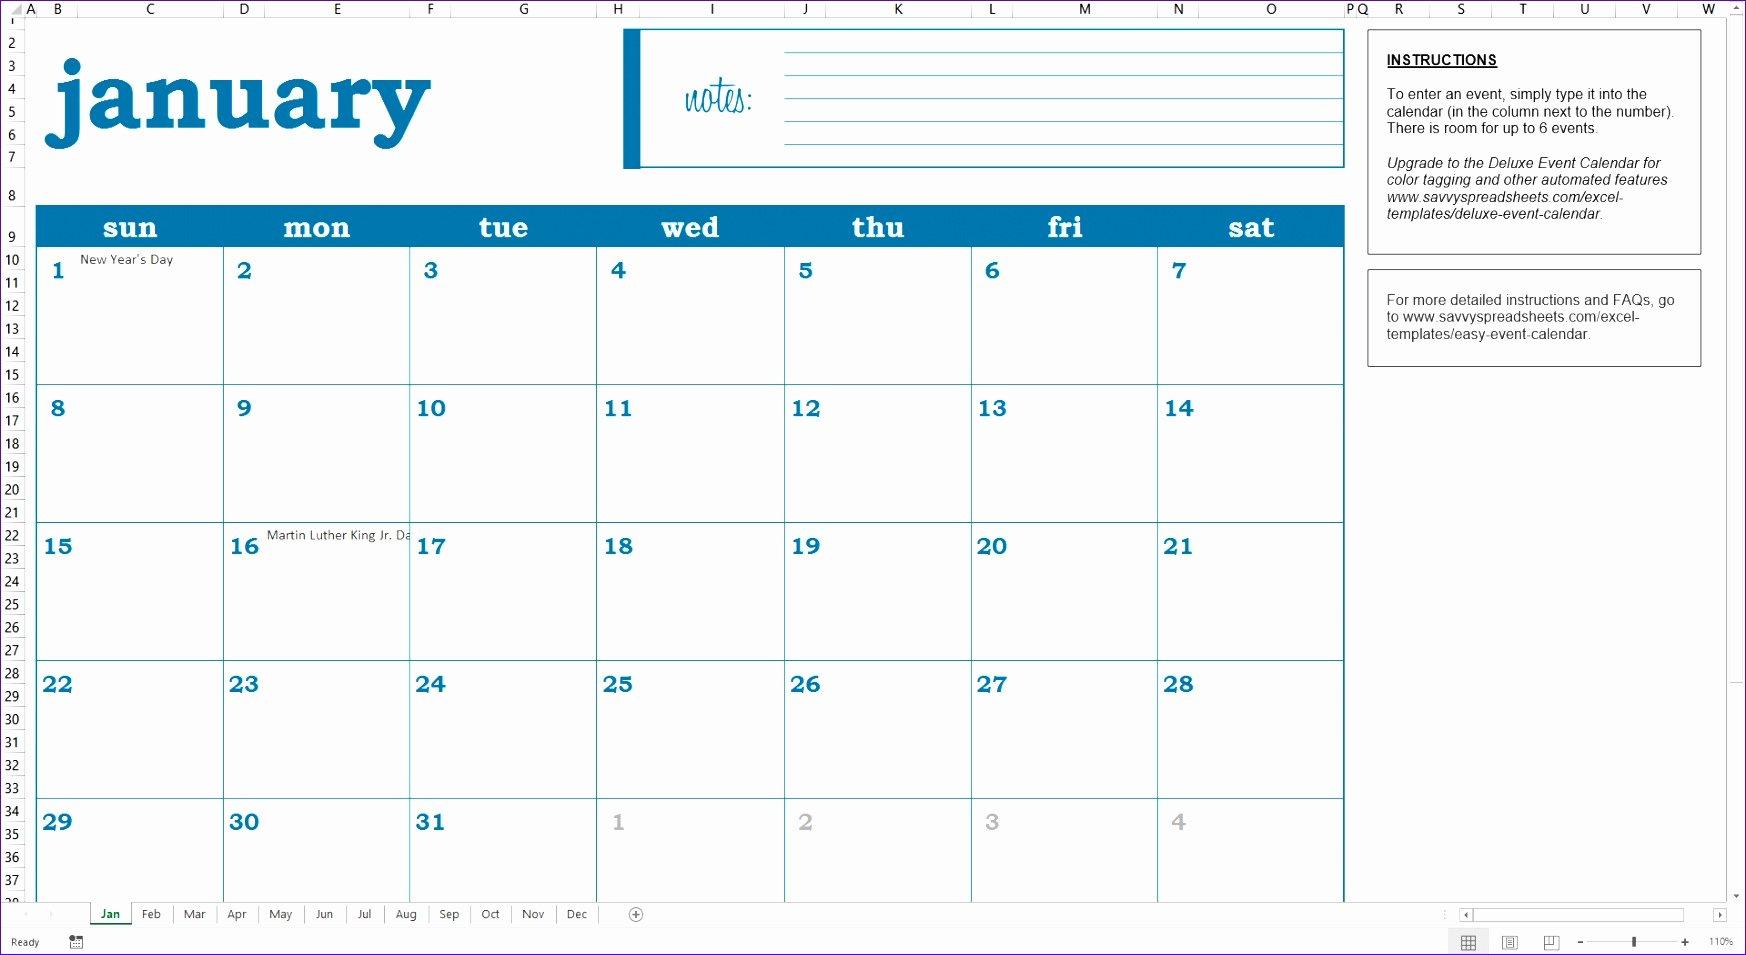 Event Planning Checklist Template Excel Elegant 8 Free event Planning Checklist Template Excel